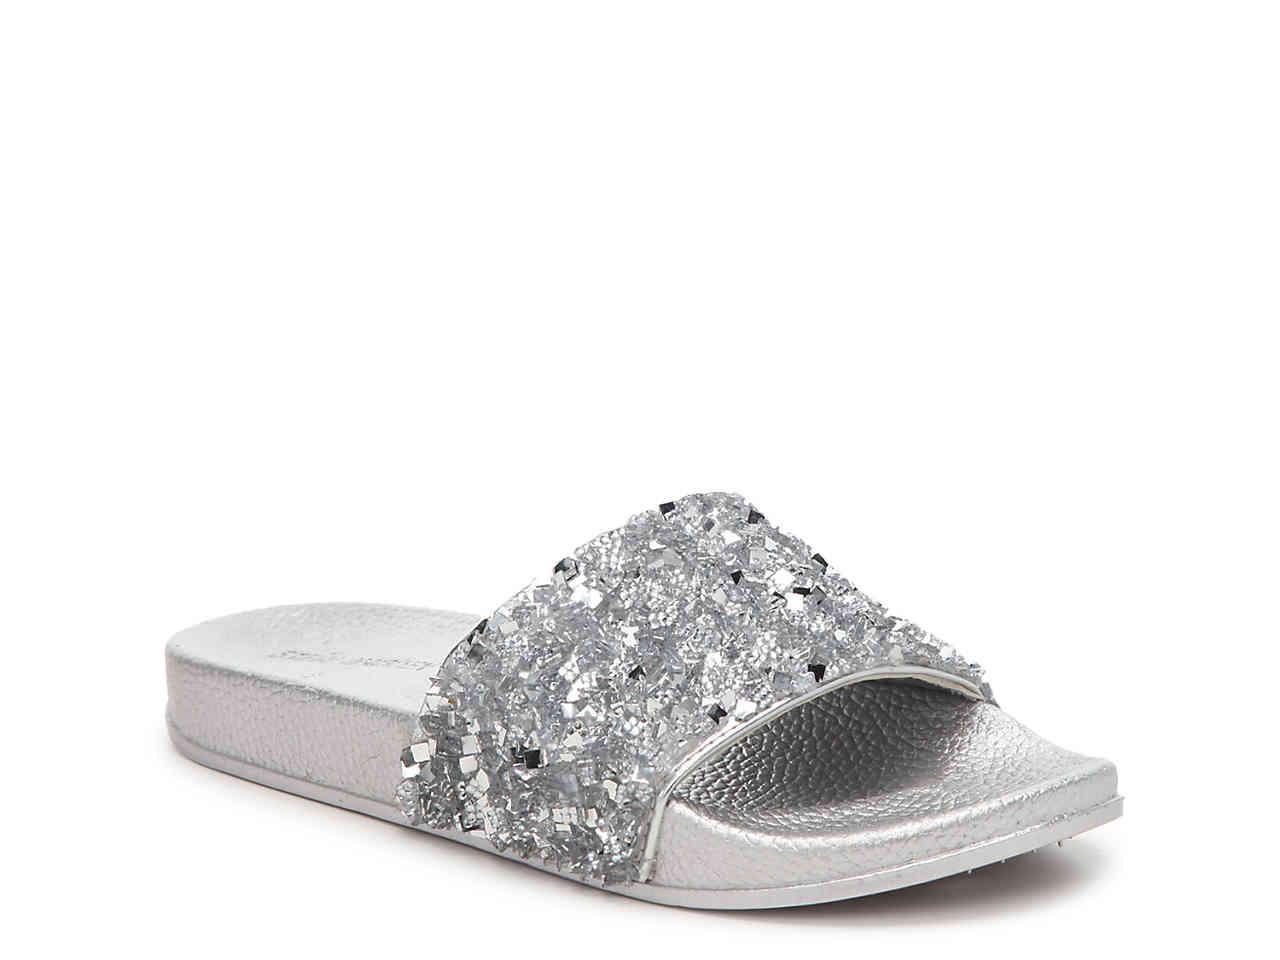 049ffd0dd6b Steve Madden Metallic Cady Slide Sandal